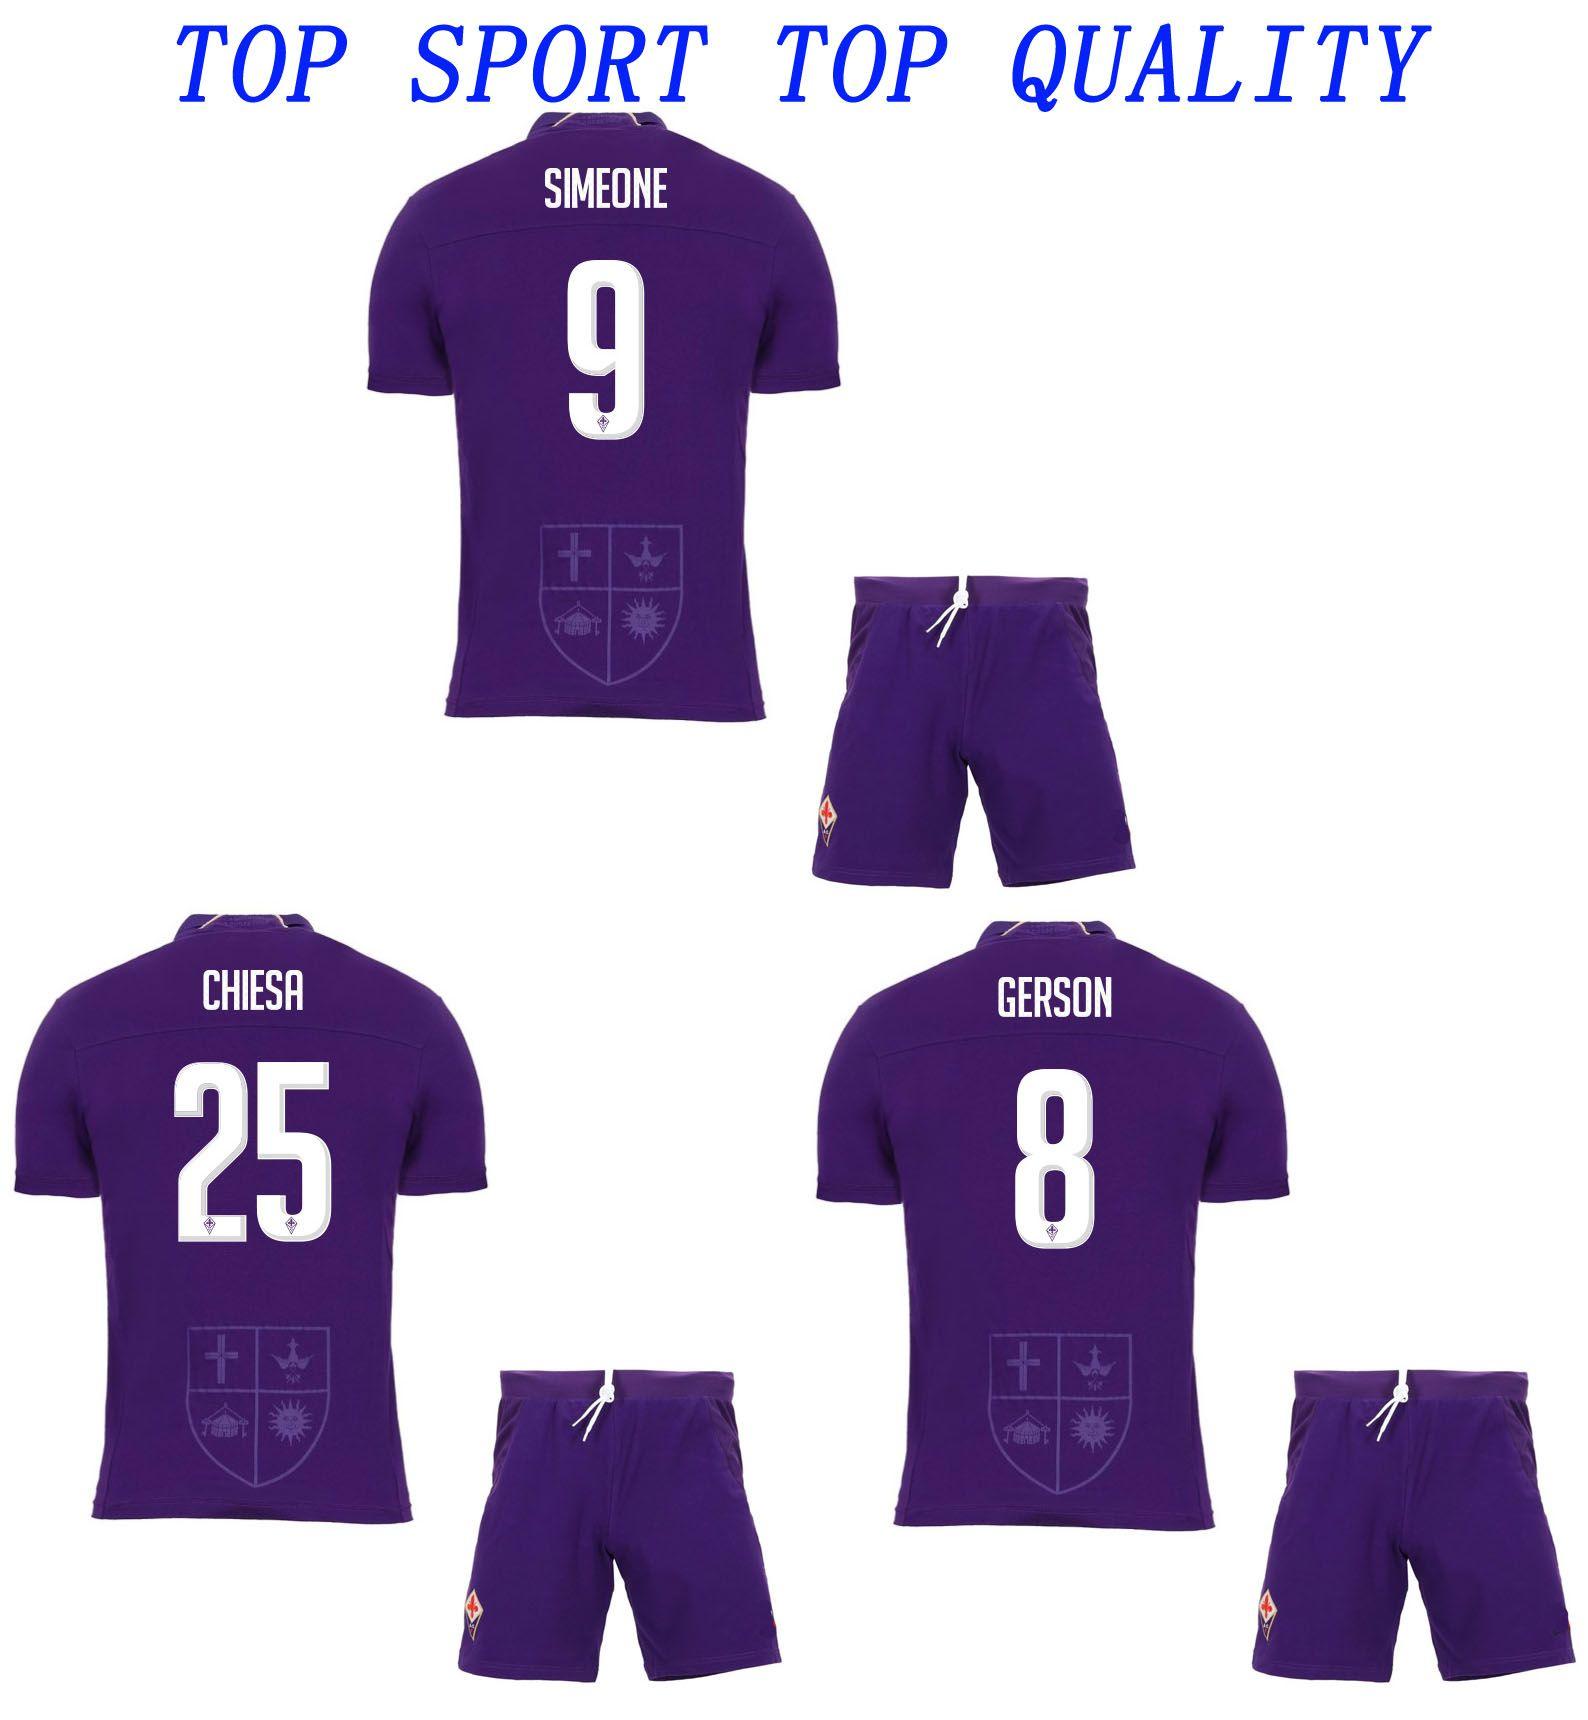 18 19 Fiorentina Home Kit Soccer Jersey Shorts 2018 19 PJACA DIKS CHIESA  VERETOUT GERSON SIMEONE Conjuntos De Fútbol ACF Calidad Tailandesa Trajes  ... 03aef3afeccb1